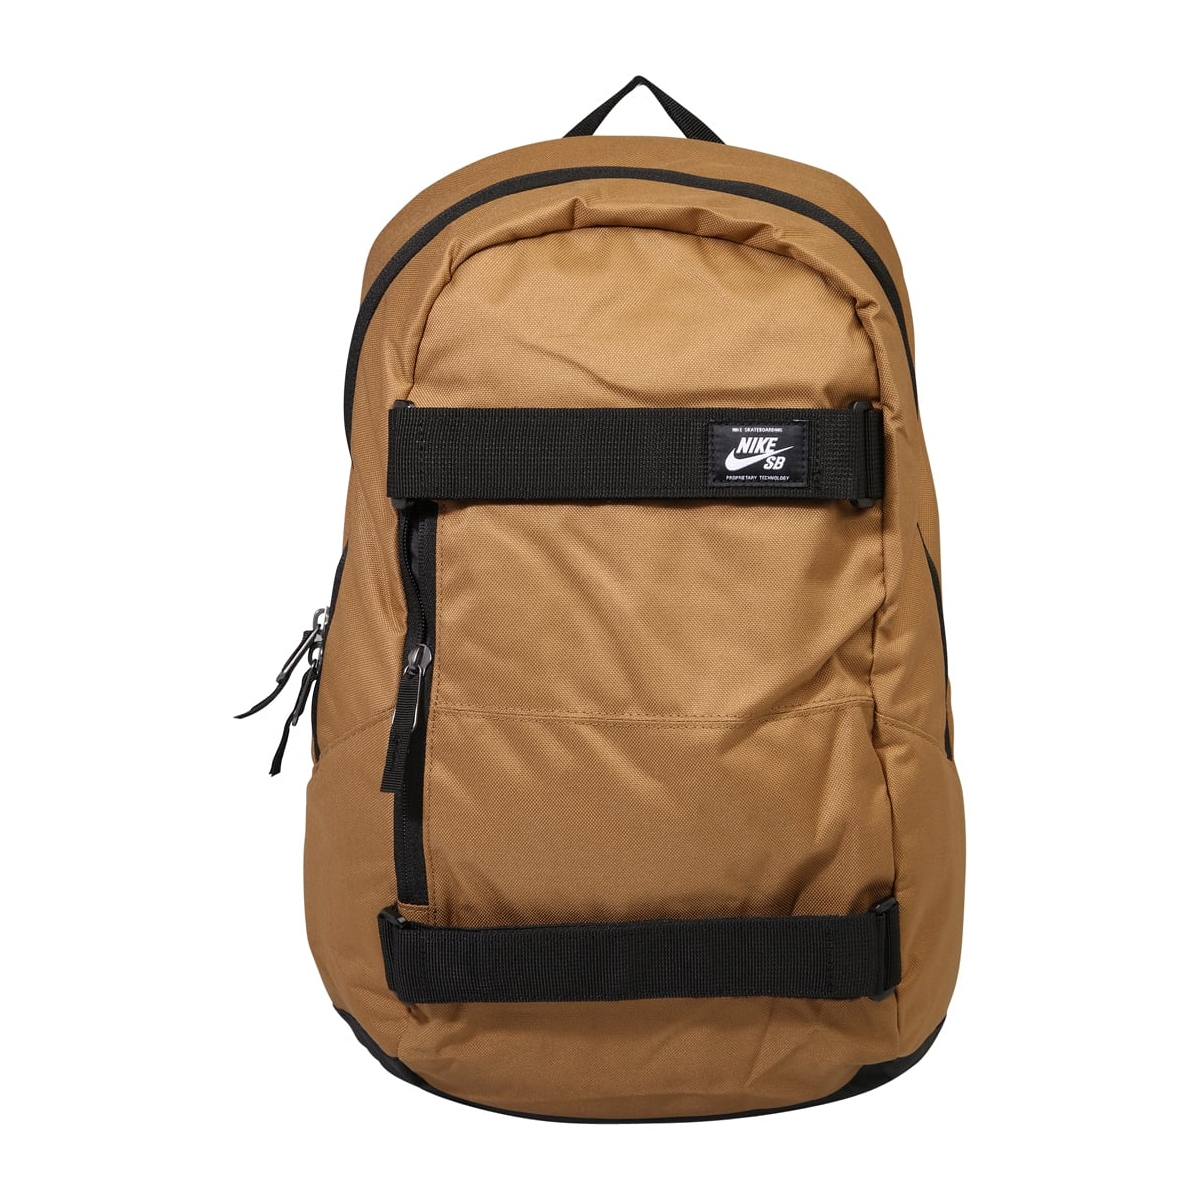 1f6daea08ff79 ... Plecak Nike SB Courthouse Golden Beige / Black / White · Zdjęcie  produktu